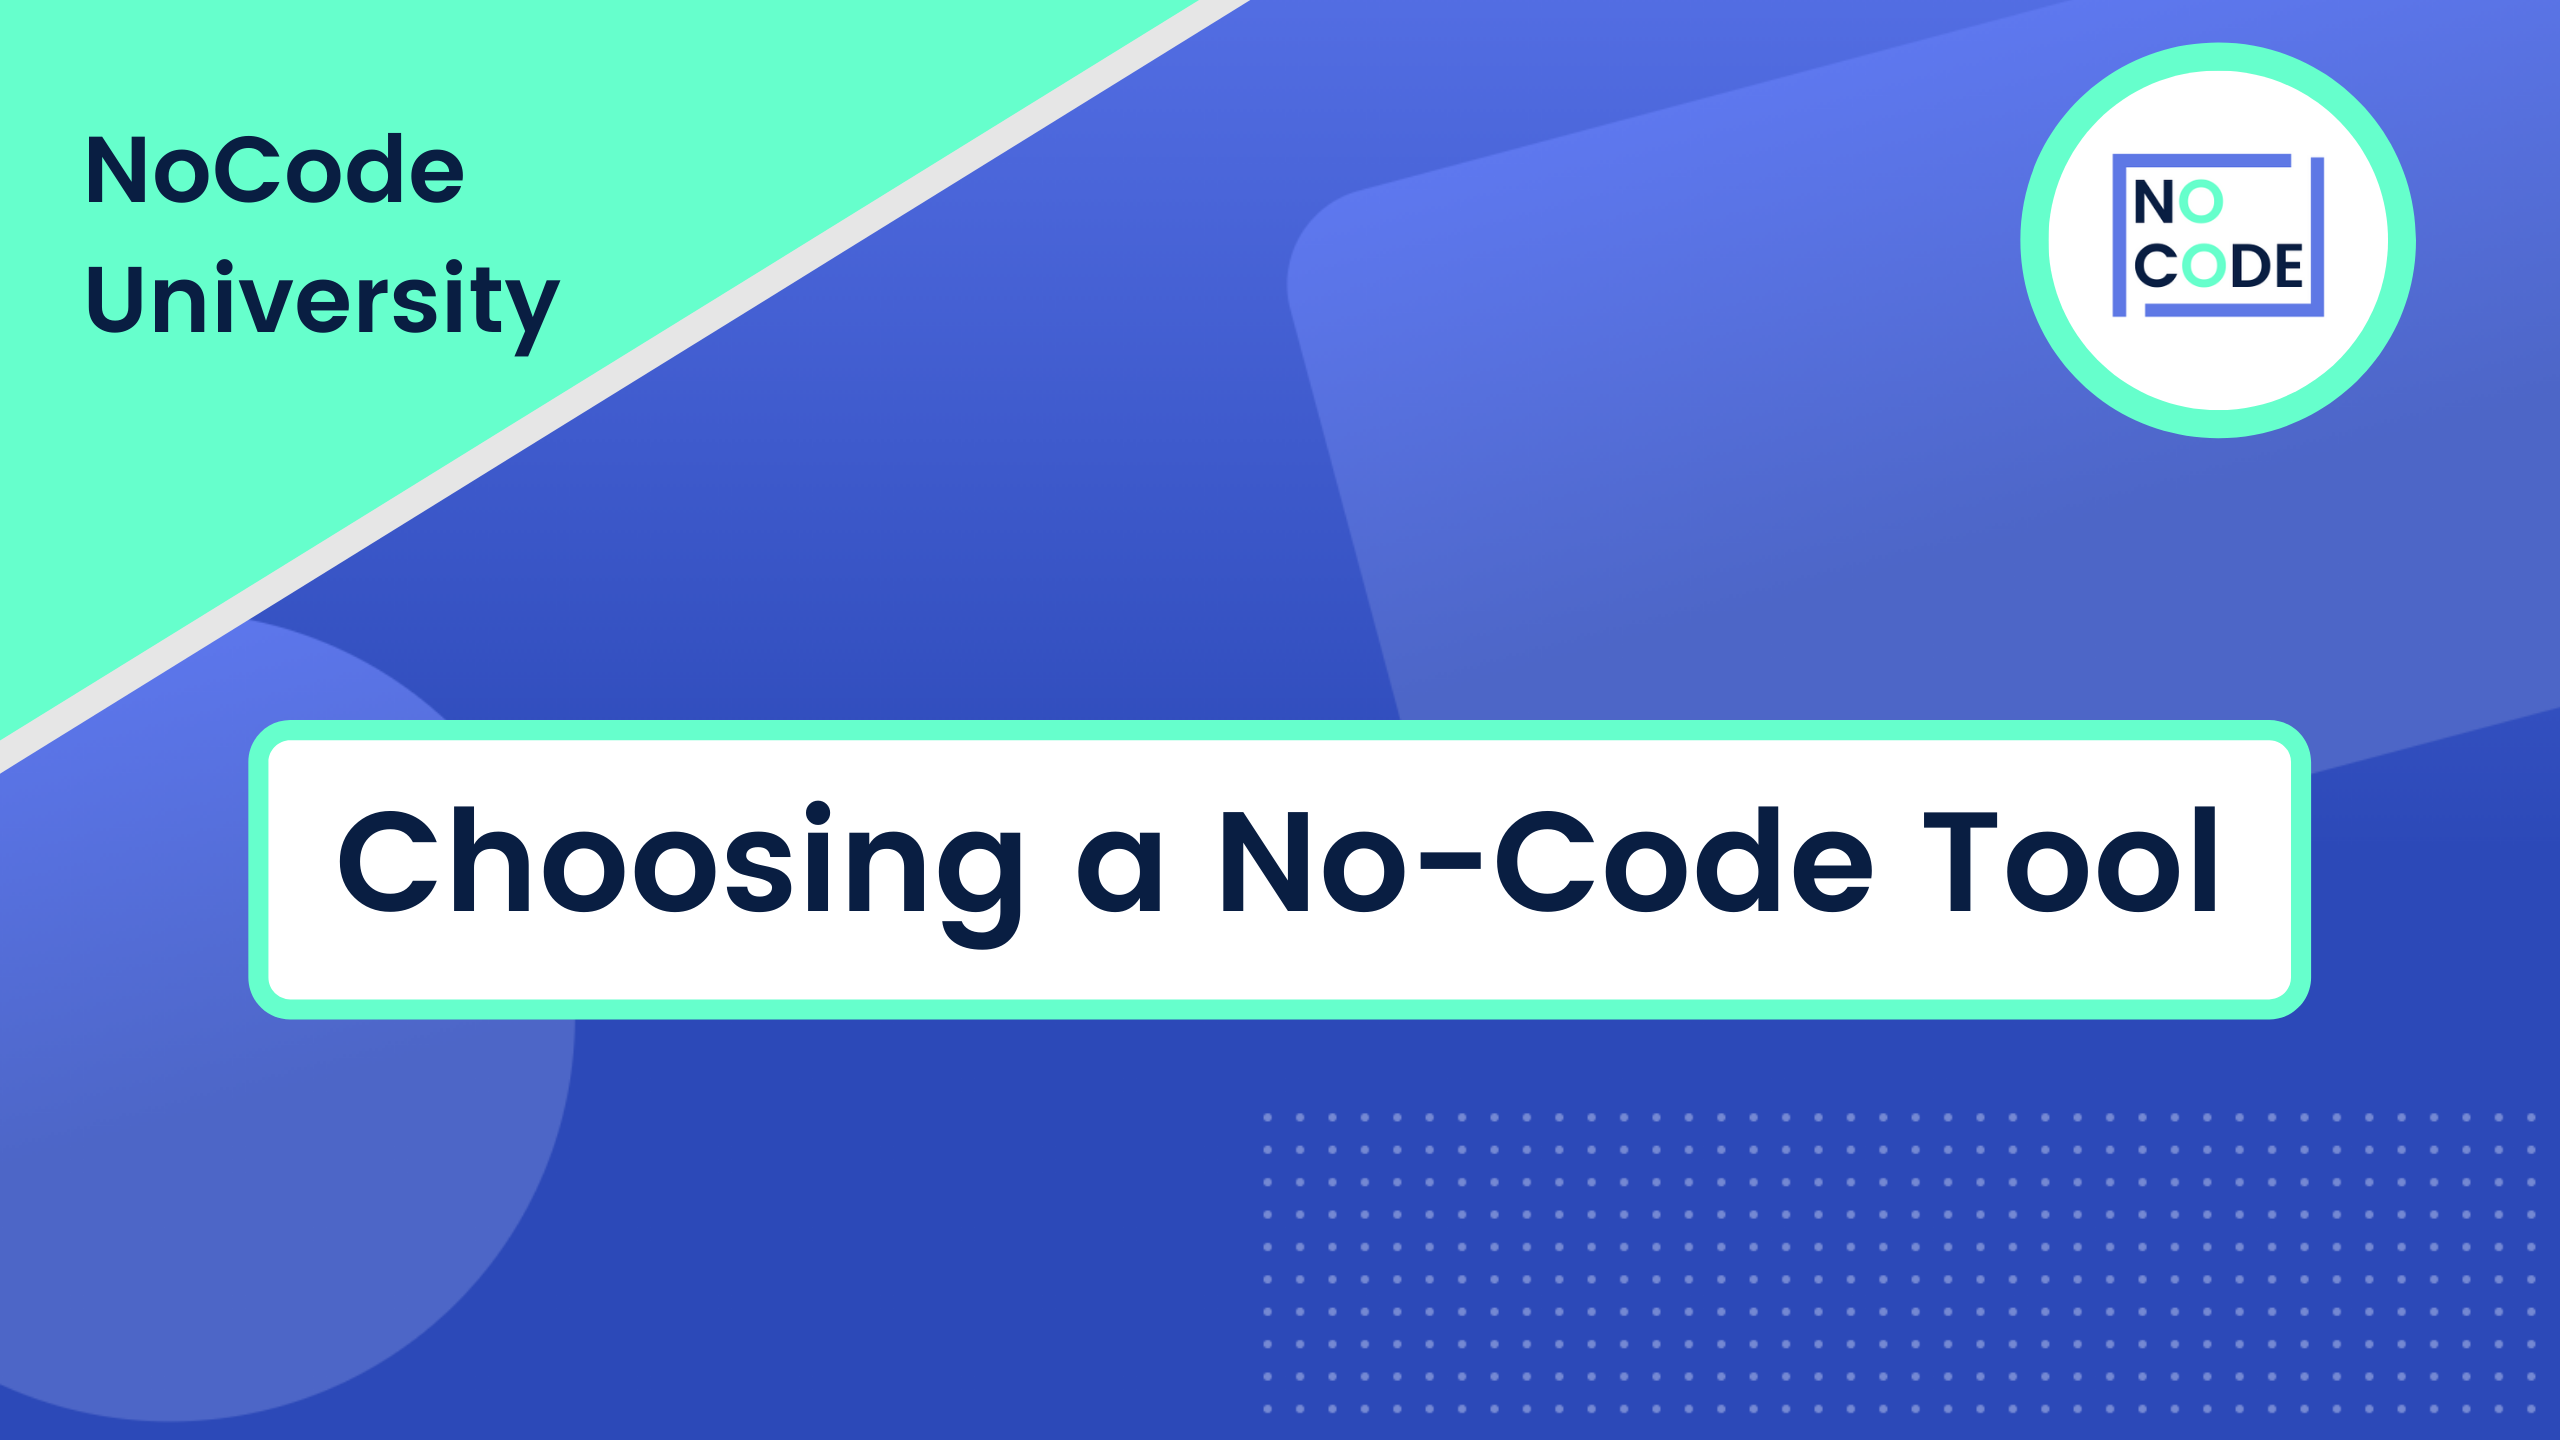 Choosing a No-Code Tool